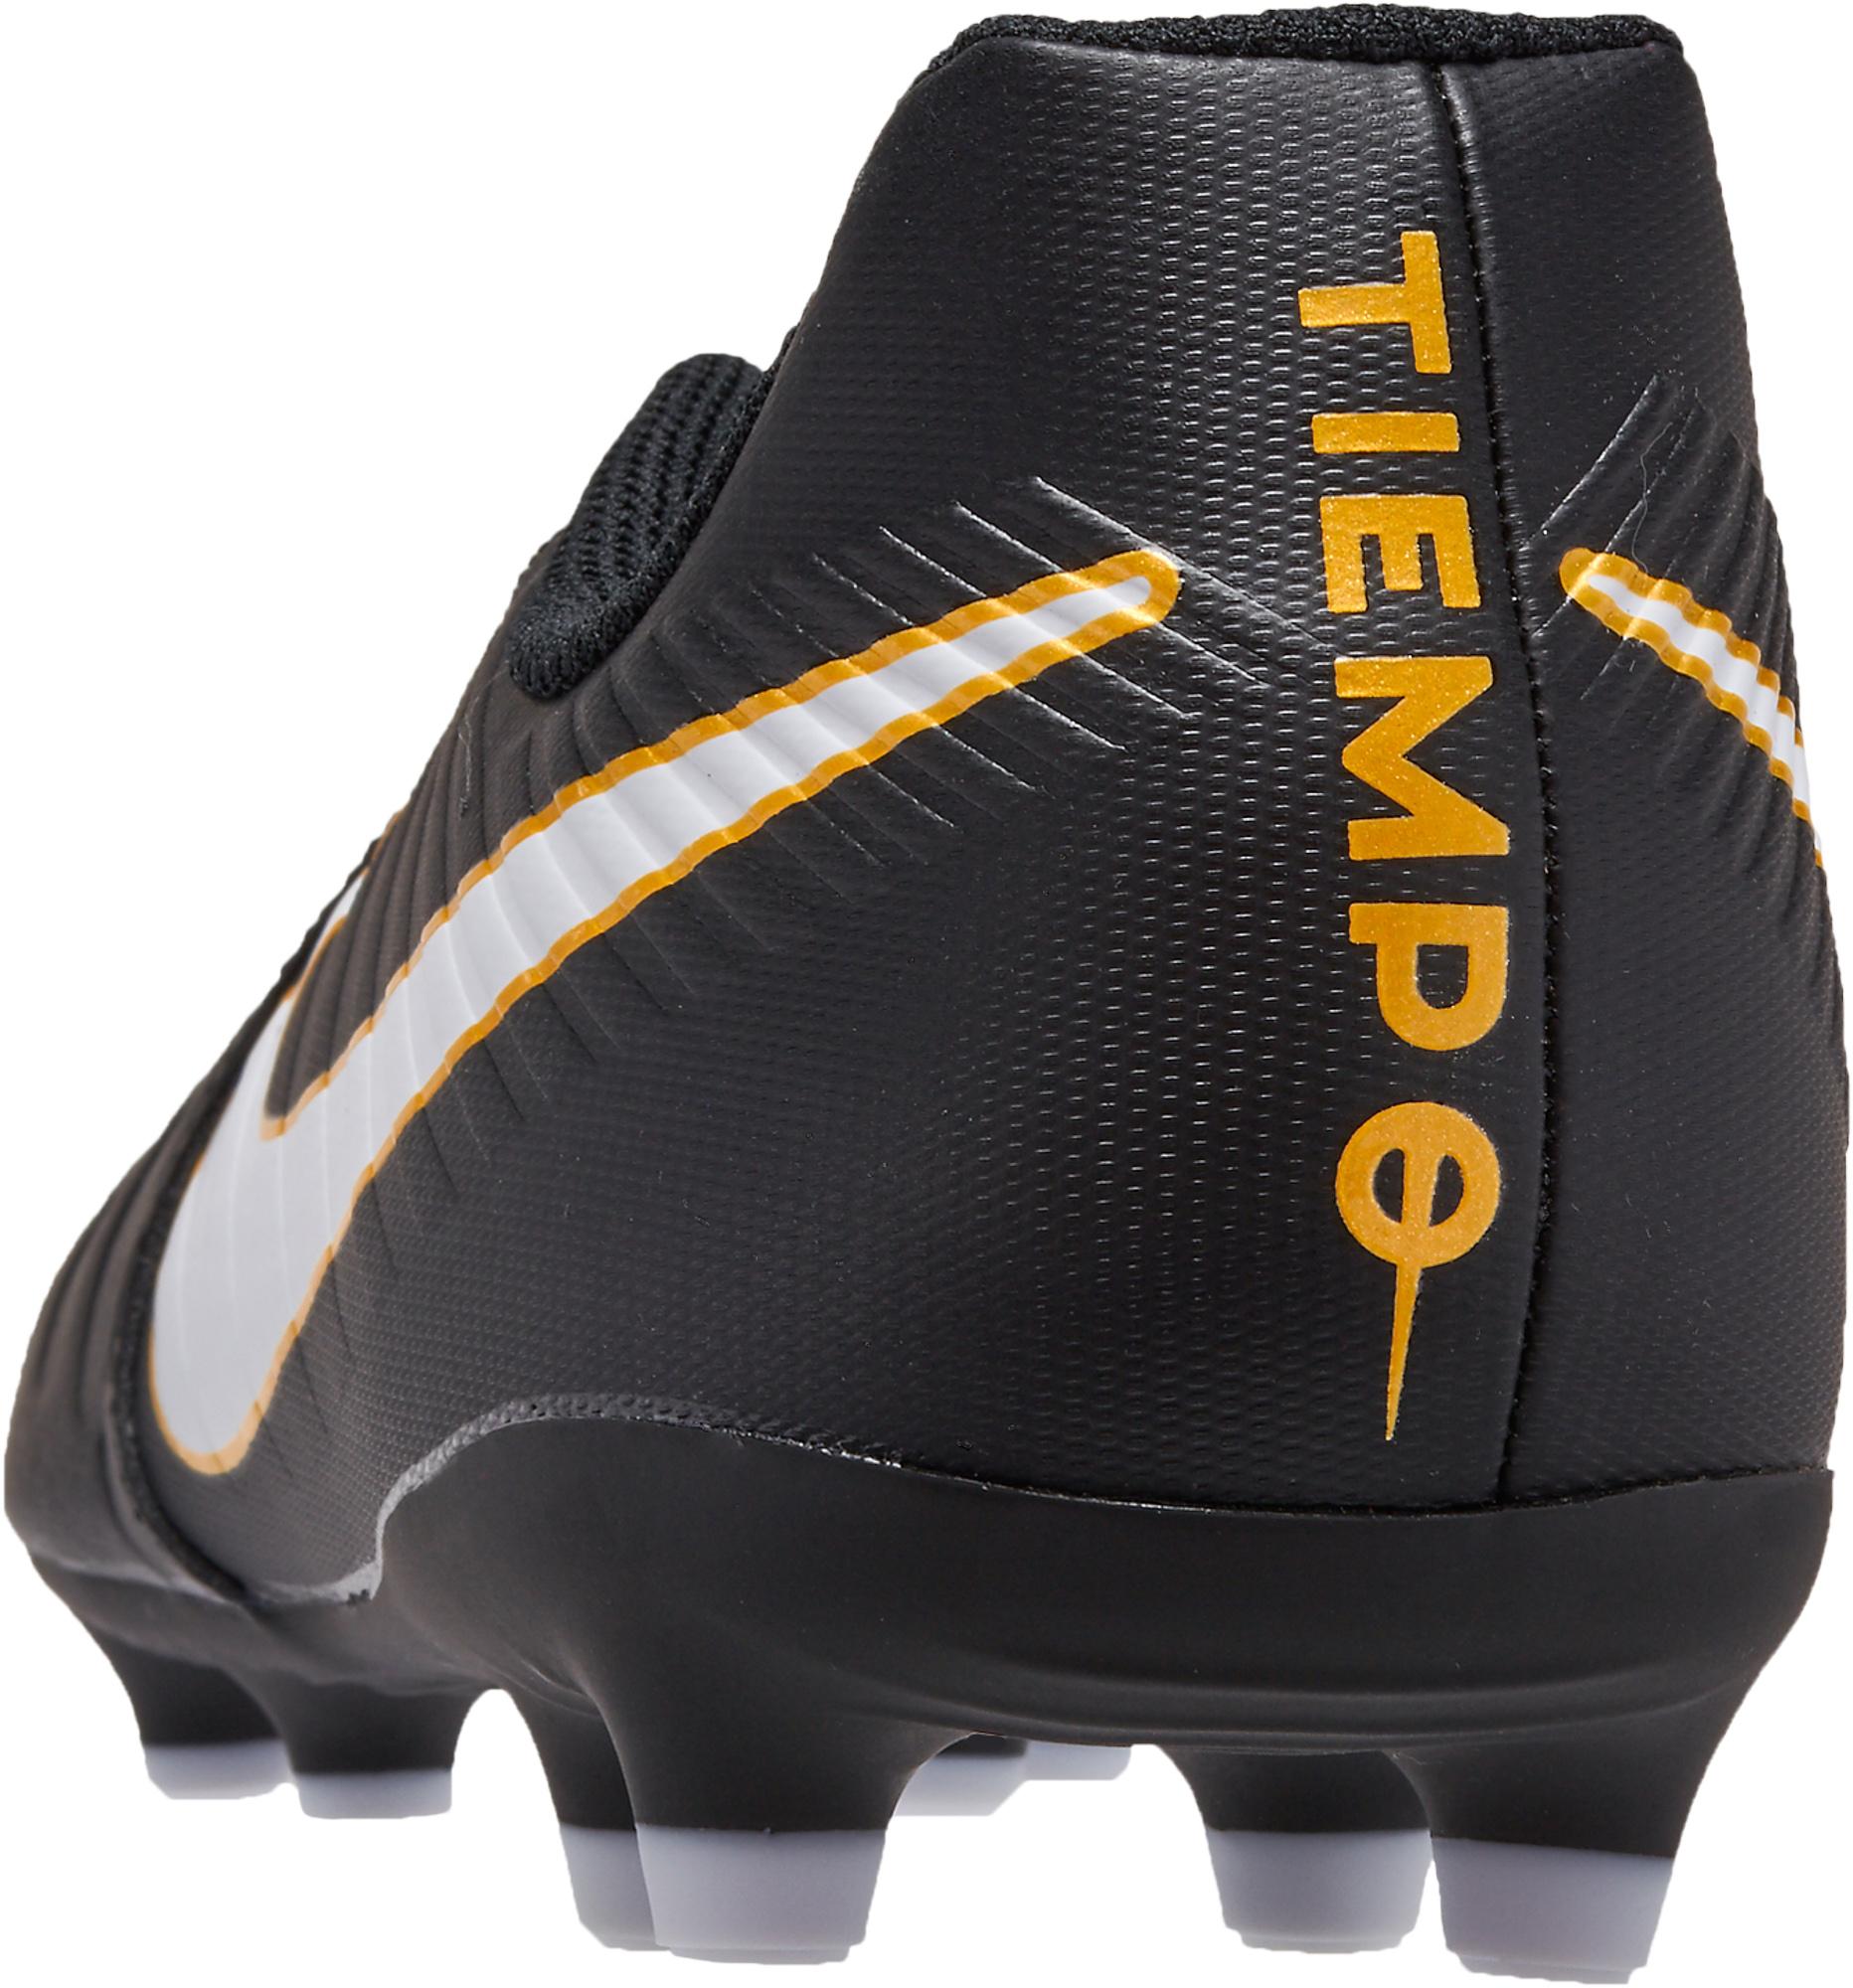 59ff9cc0bda7b9 Nike Kids Tiempo Rio IV FG Soccer Cleats - Black   White - Soccer Master